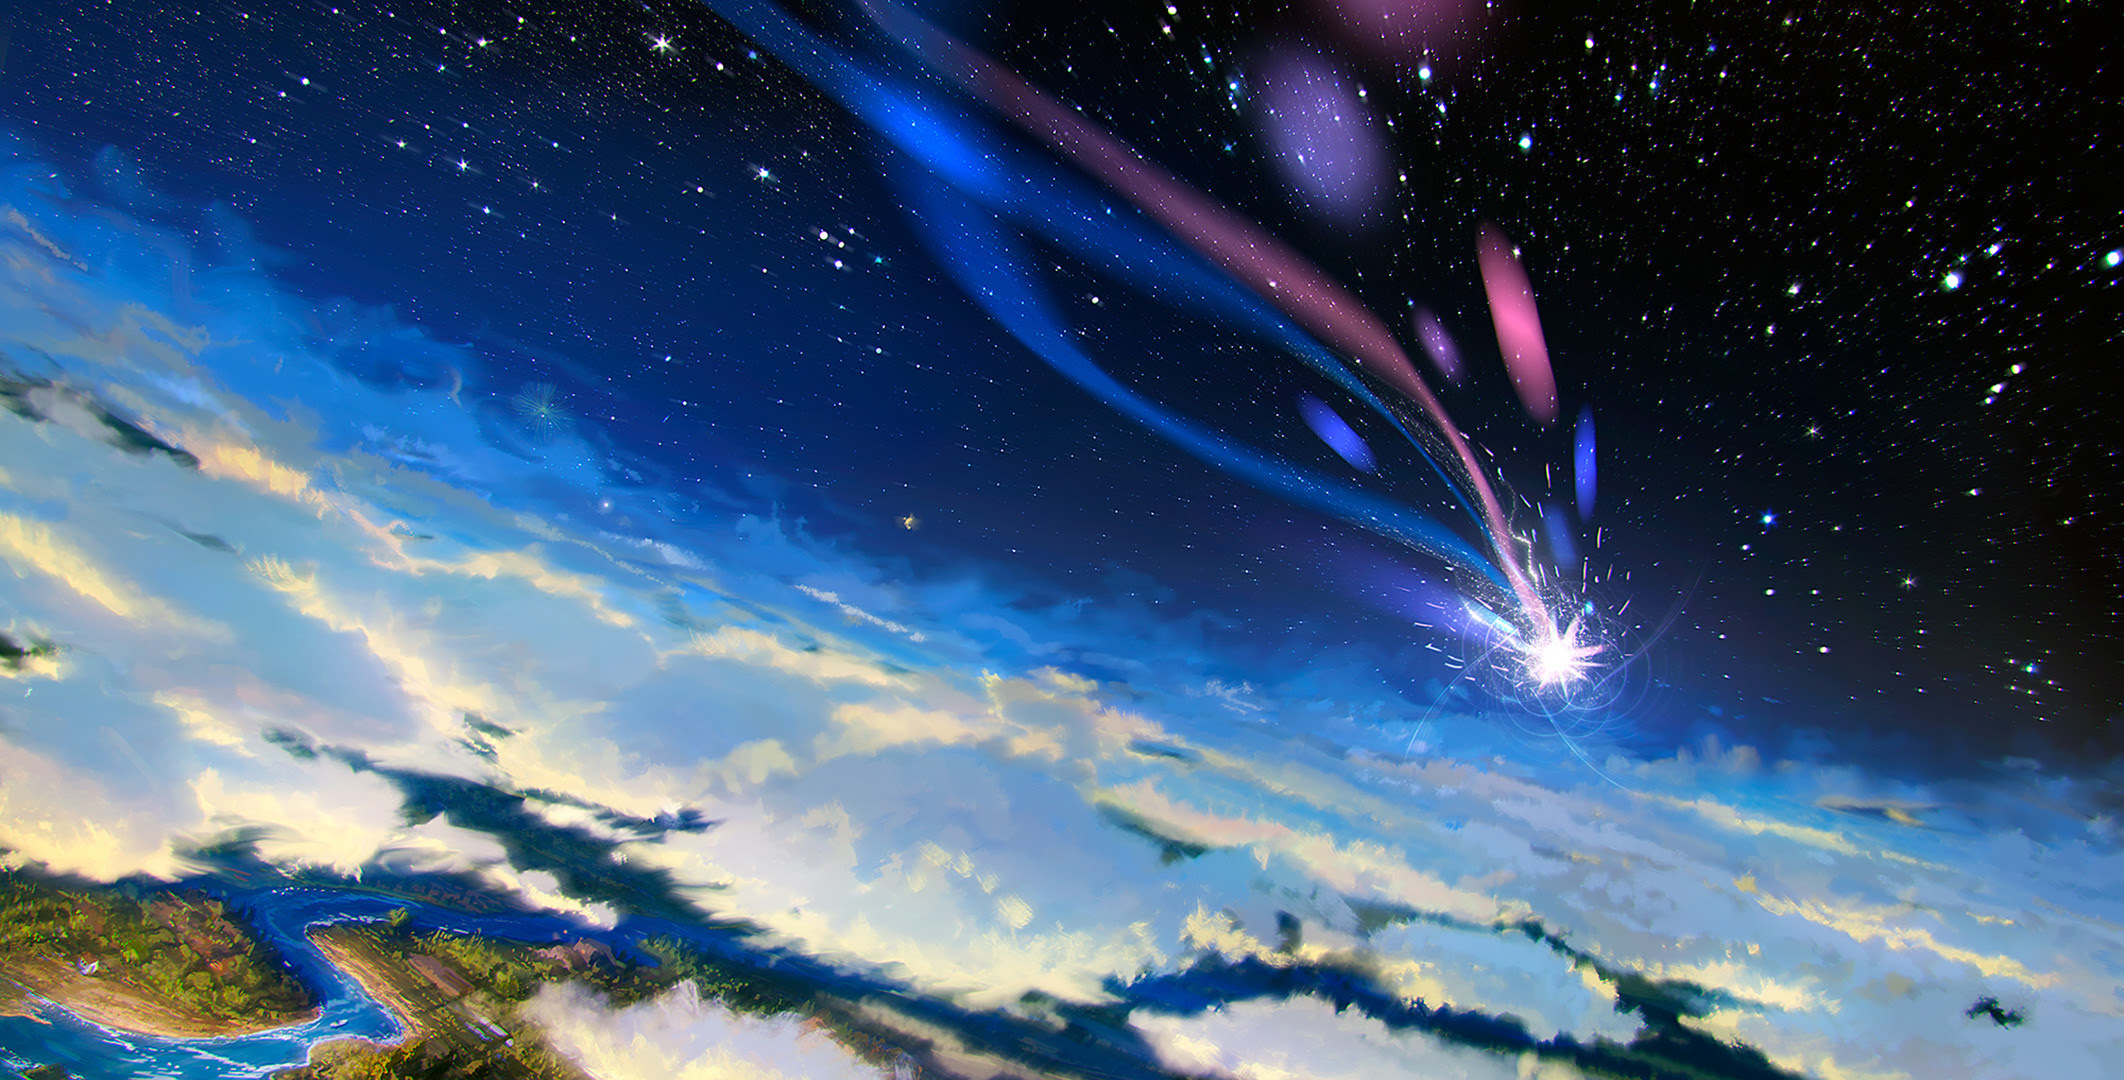 Shooting Stars Wallpaper (76+ images)